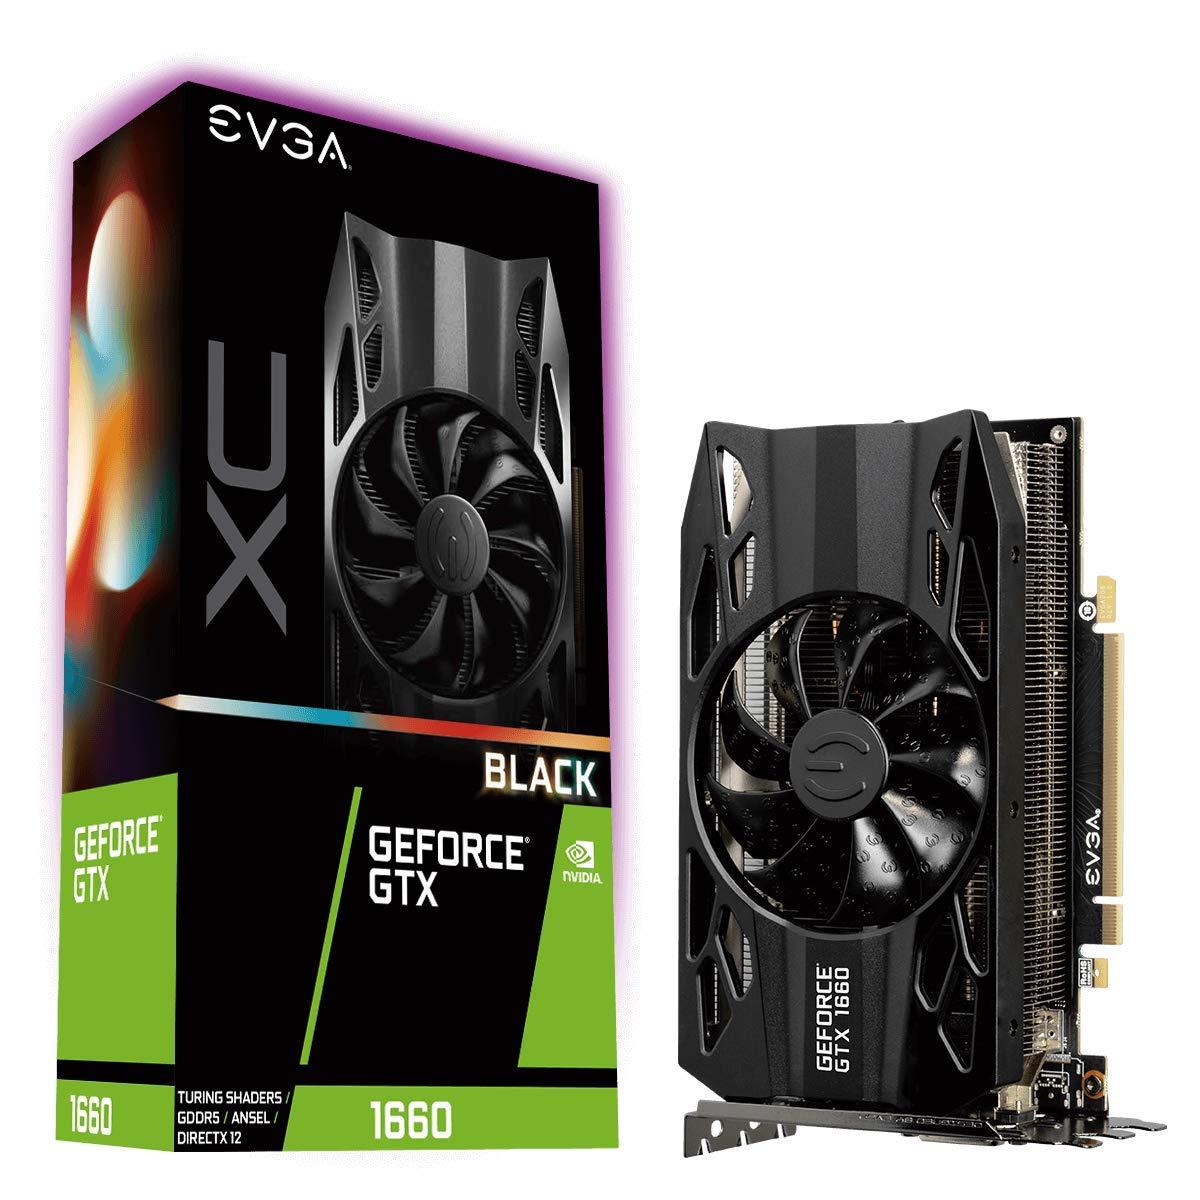 EVGA GeForce GTX 1660 XC BLACK GAMING, 6GB GDDR5, HDB Fan, Graphics Card £208.99 @ Amazon